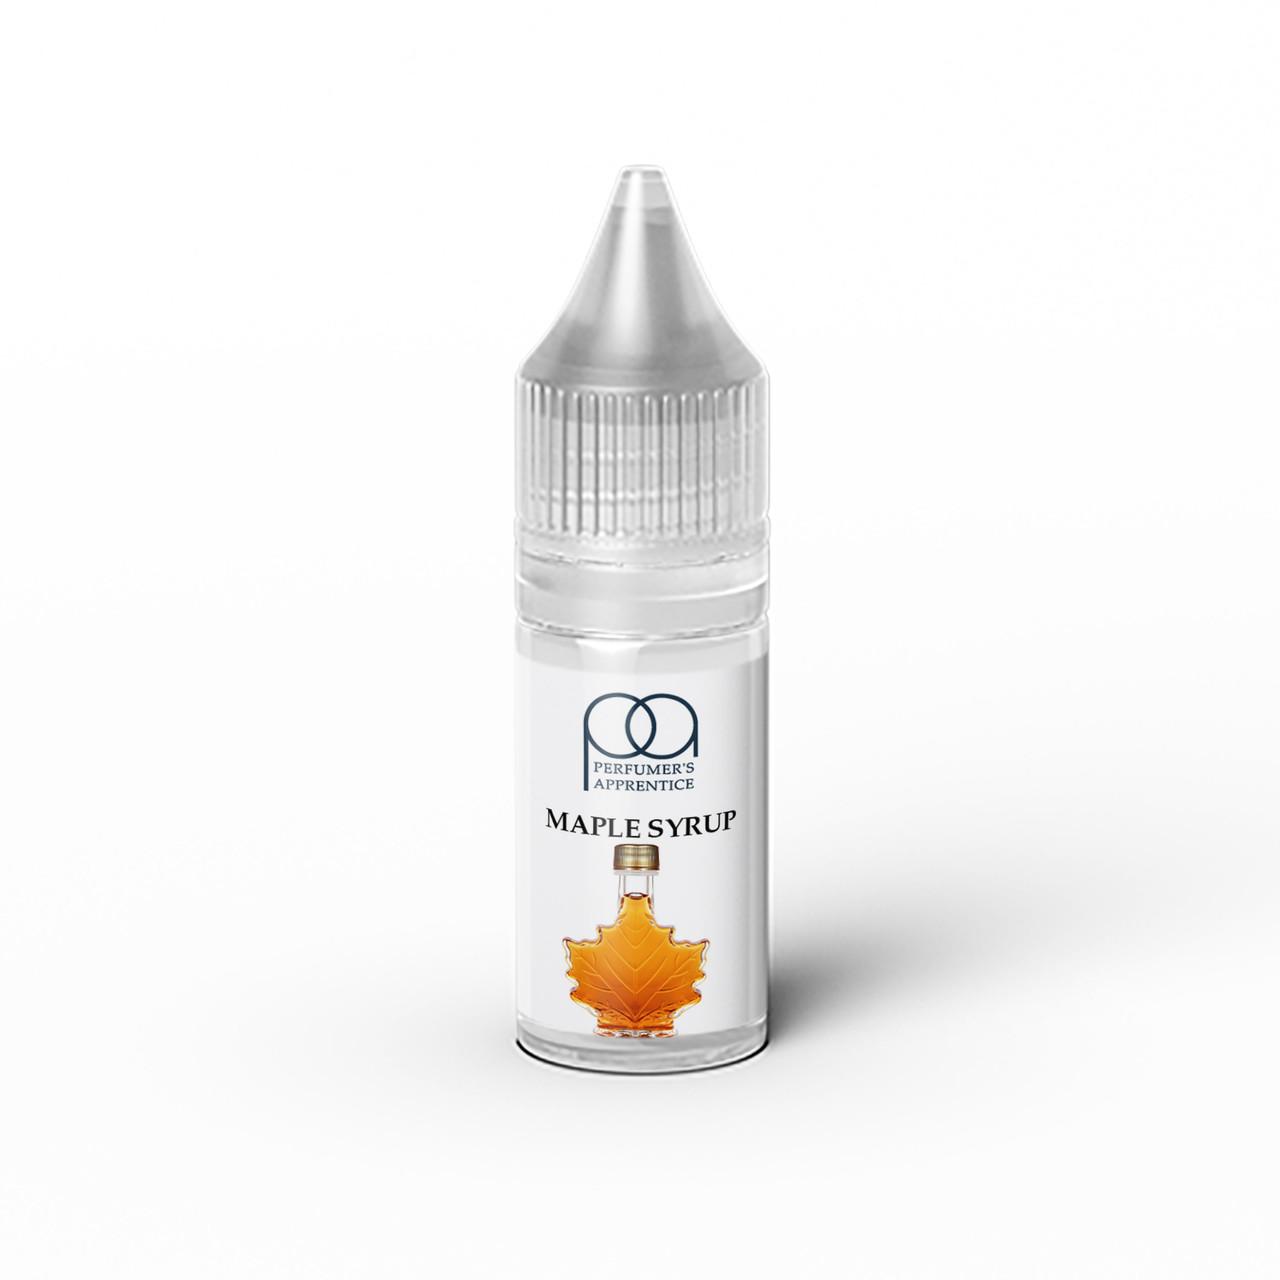 Ароматизатор The perfumer's apprentice TPA -Maple Syrup (Кленовый сироп)